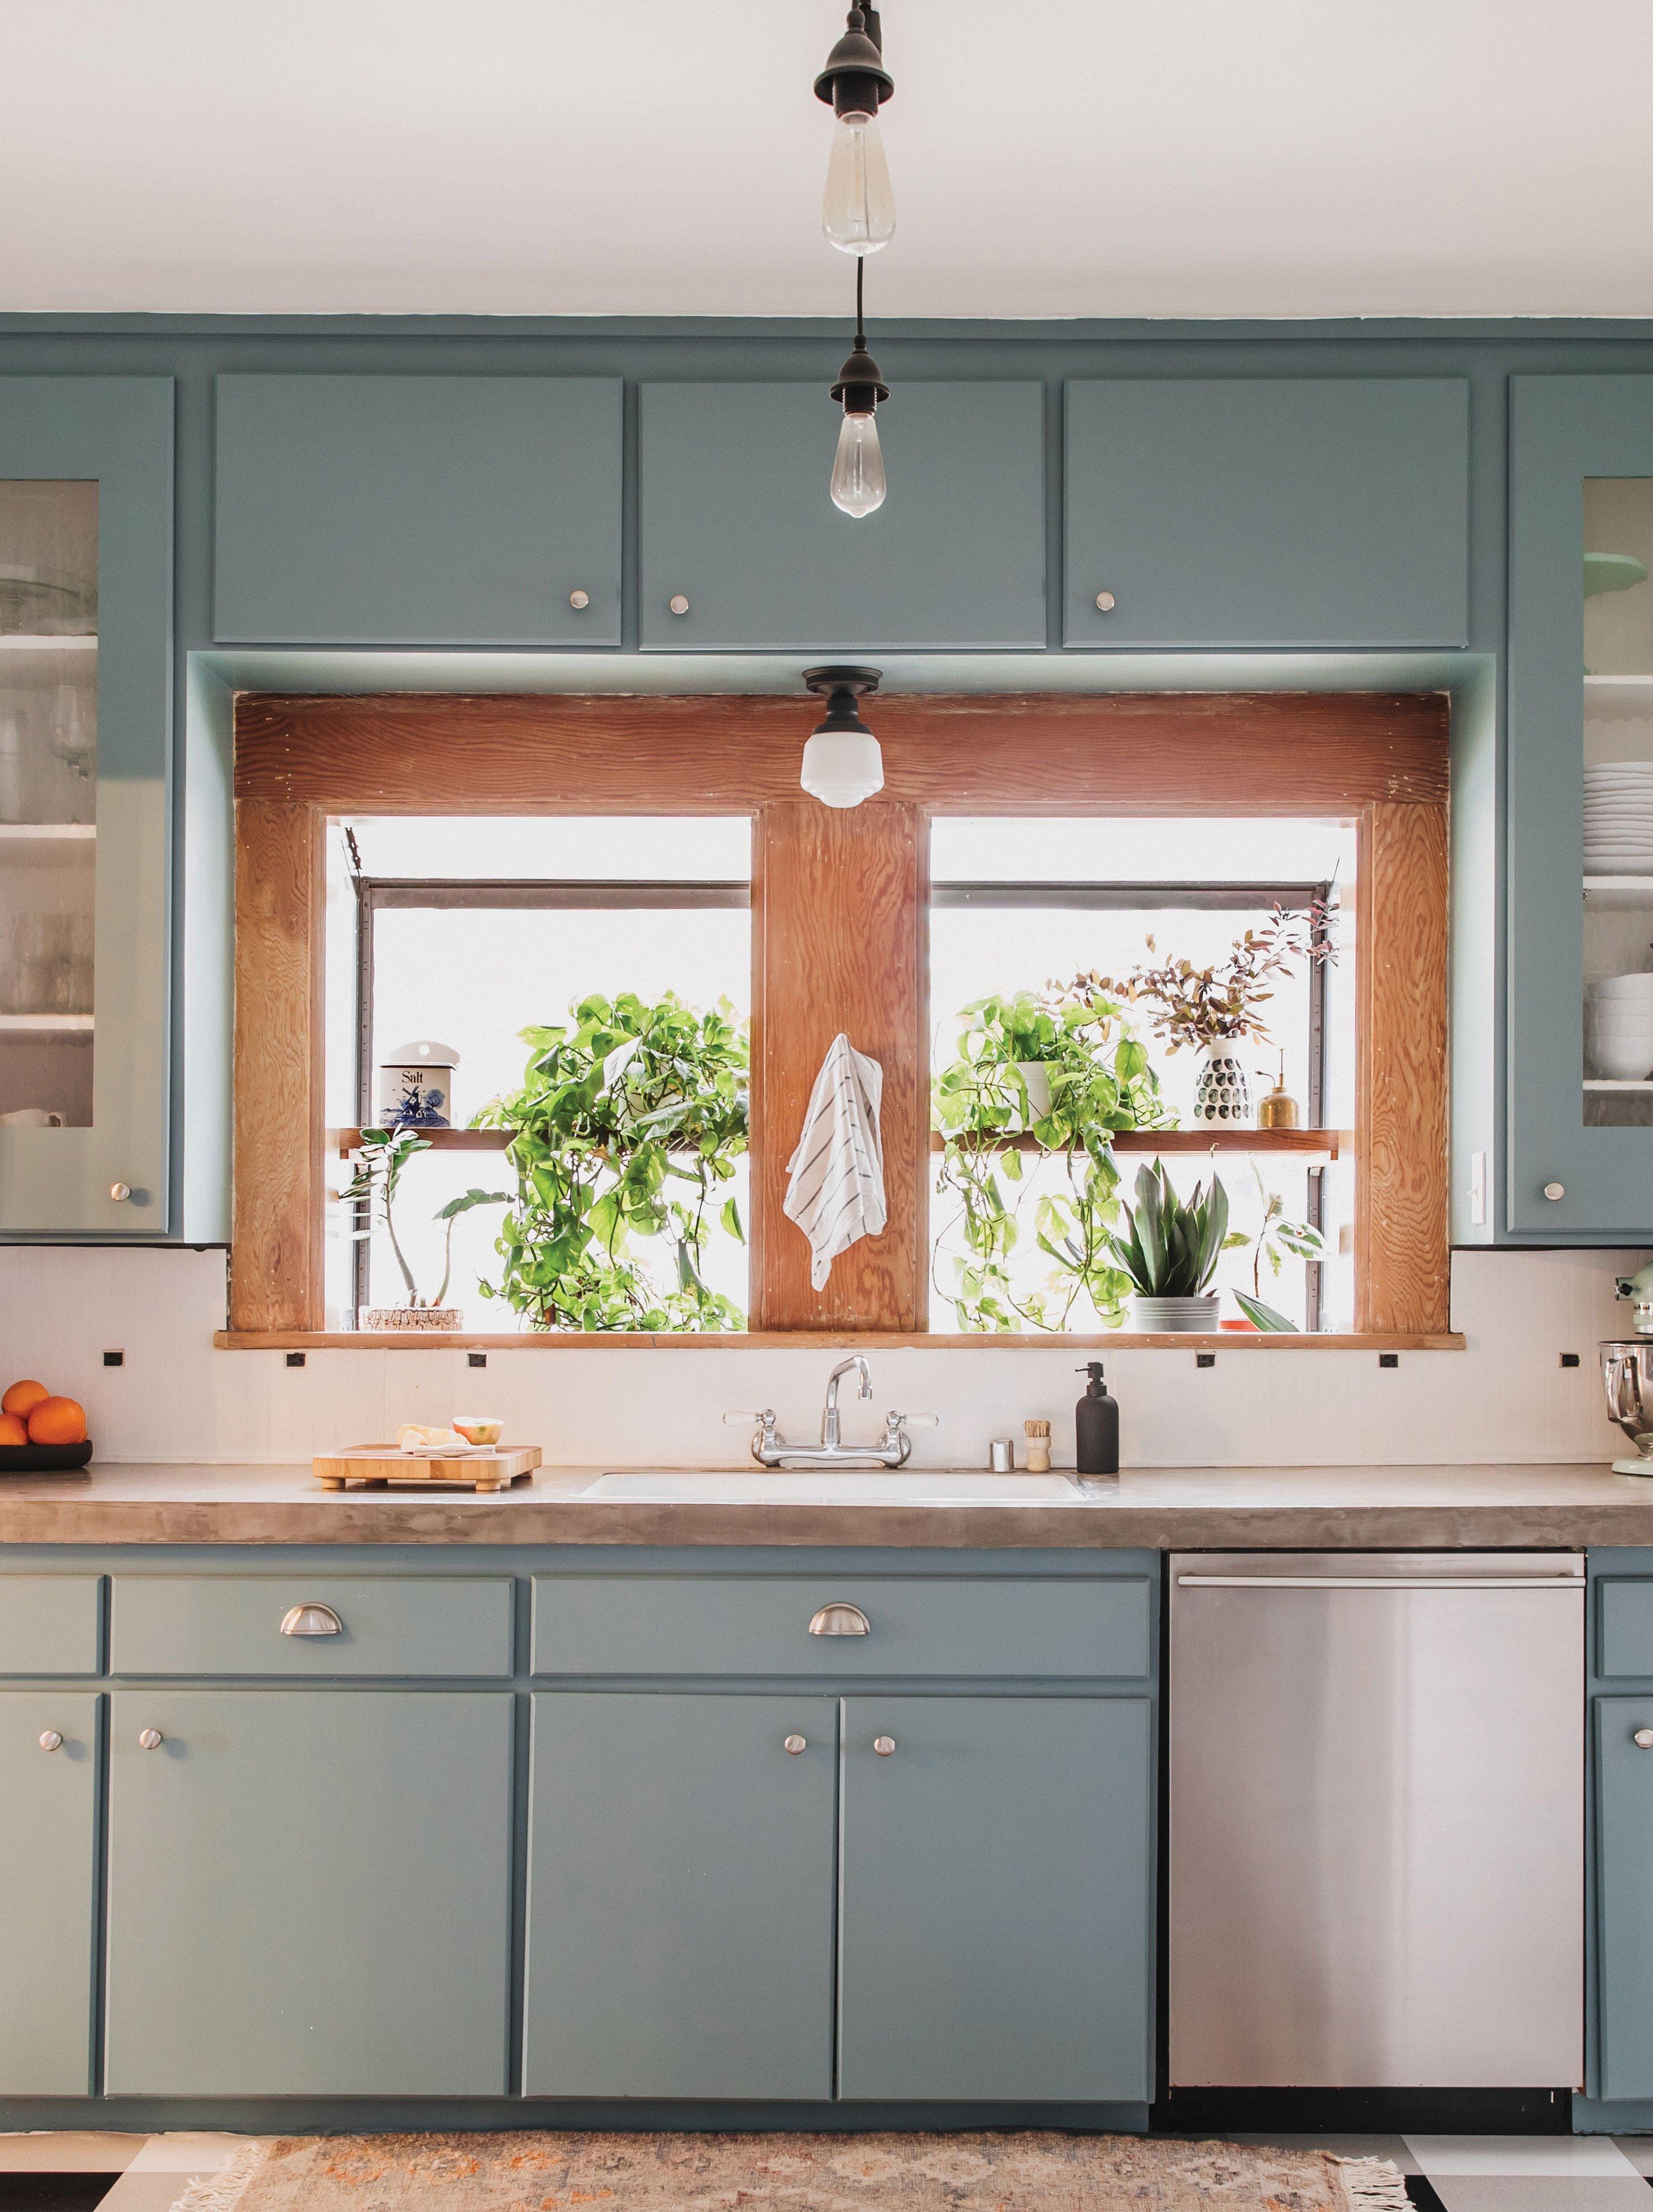 DIY kitchen changes fresh lighting